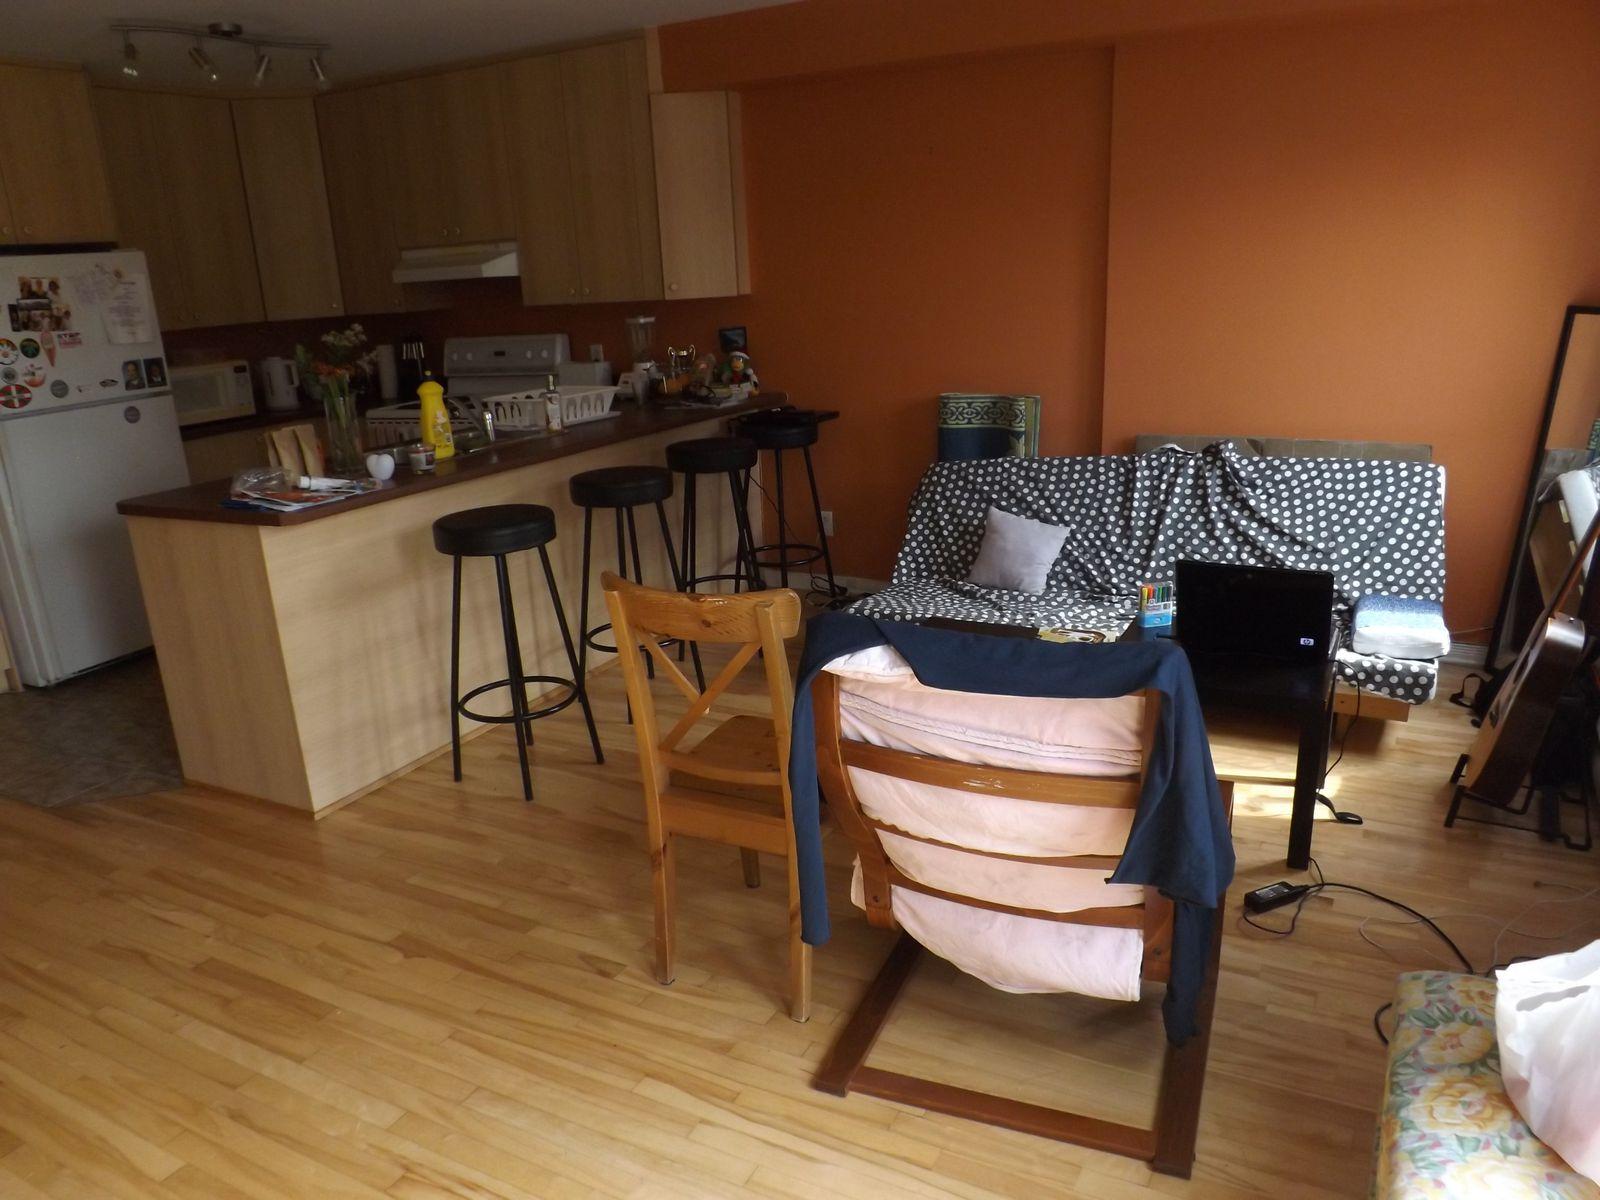 nouvel appartement chti canadien. Black Bedroom Furniture Sets. Home Design Ideas